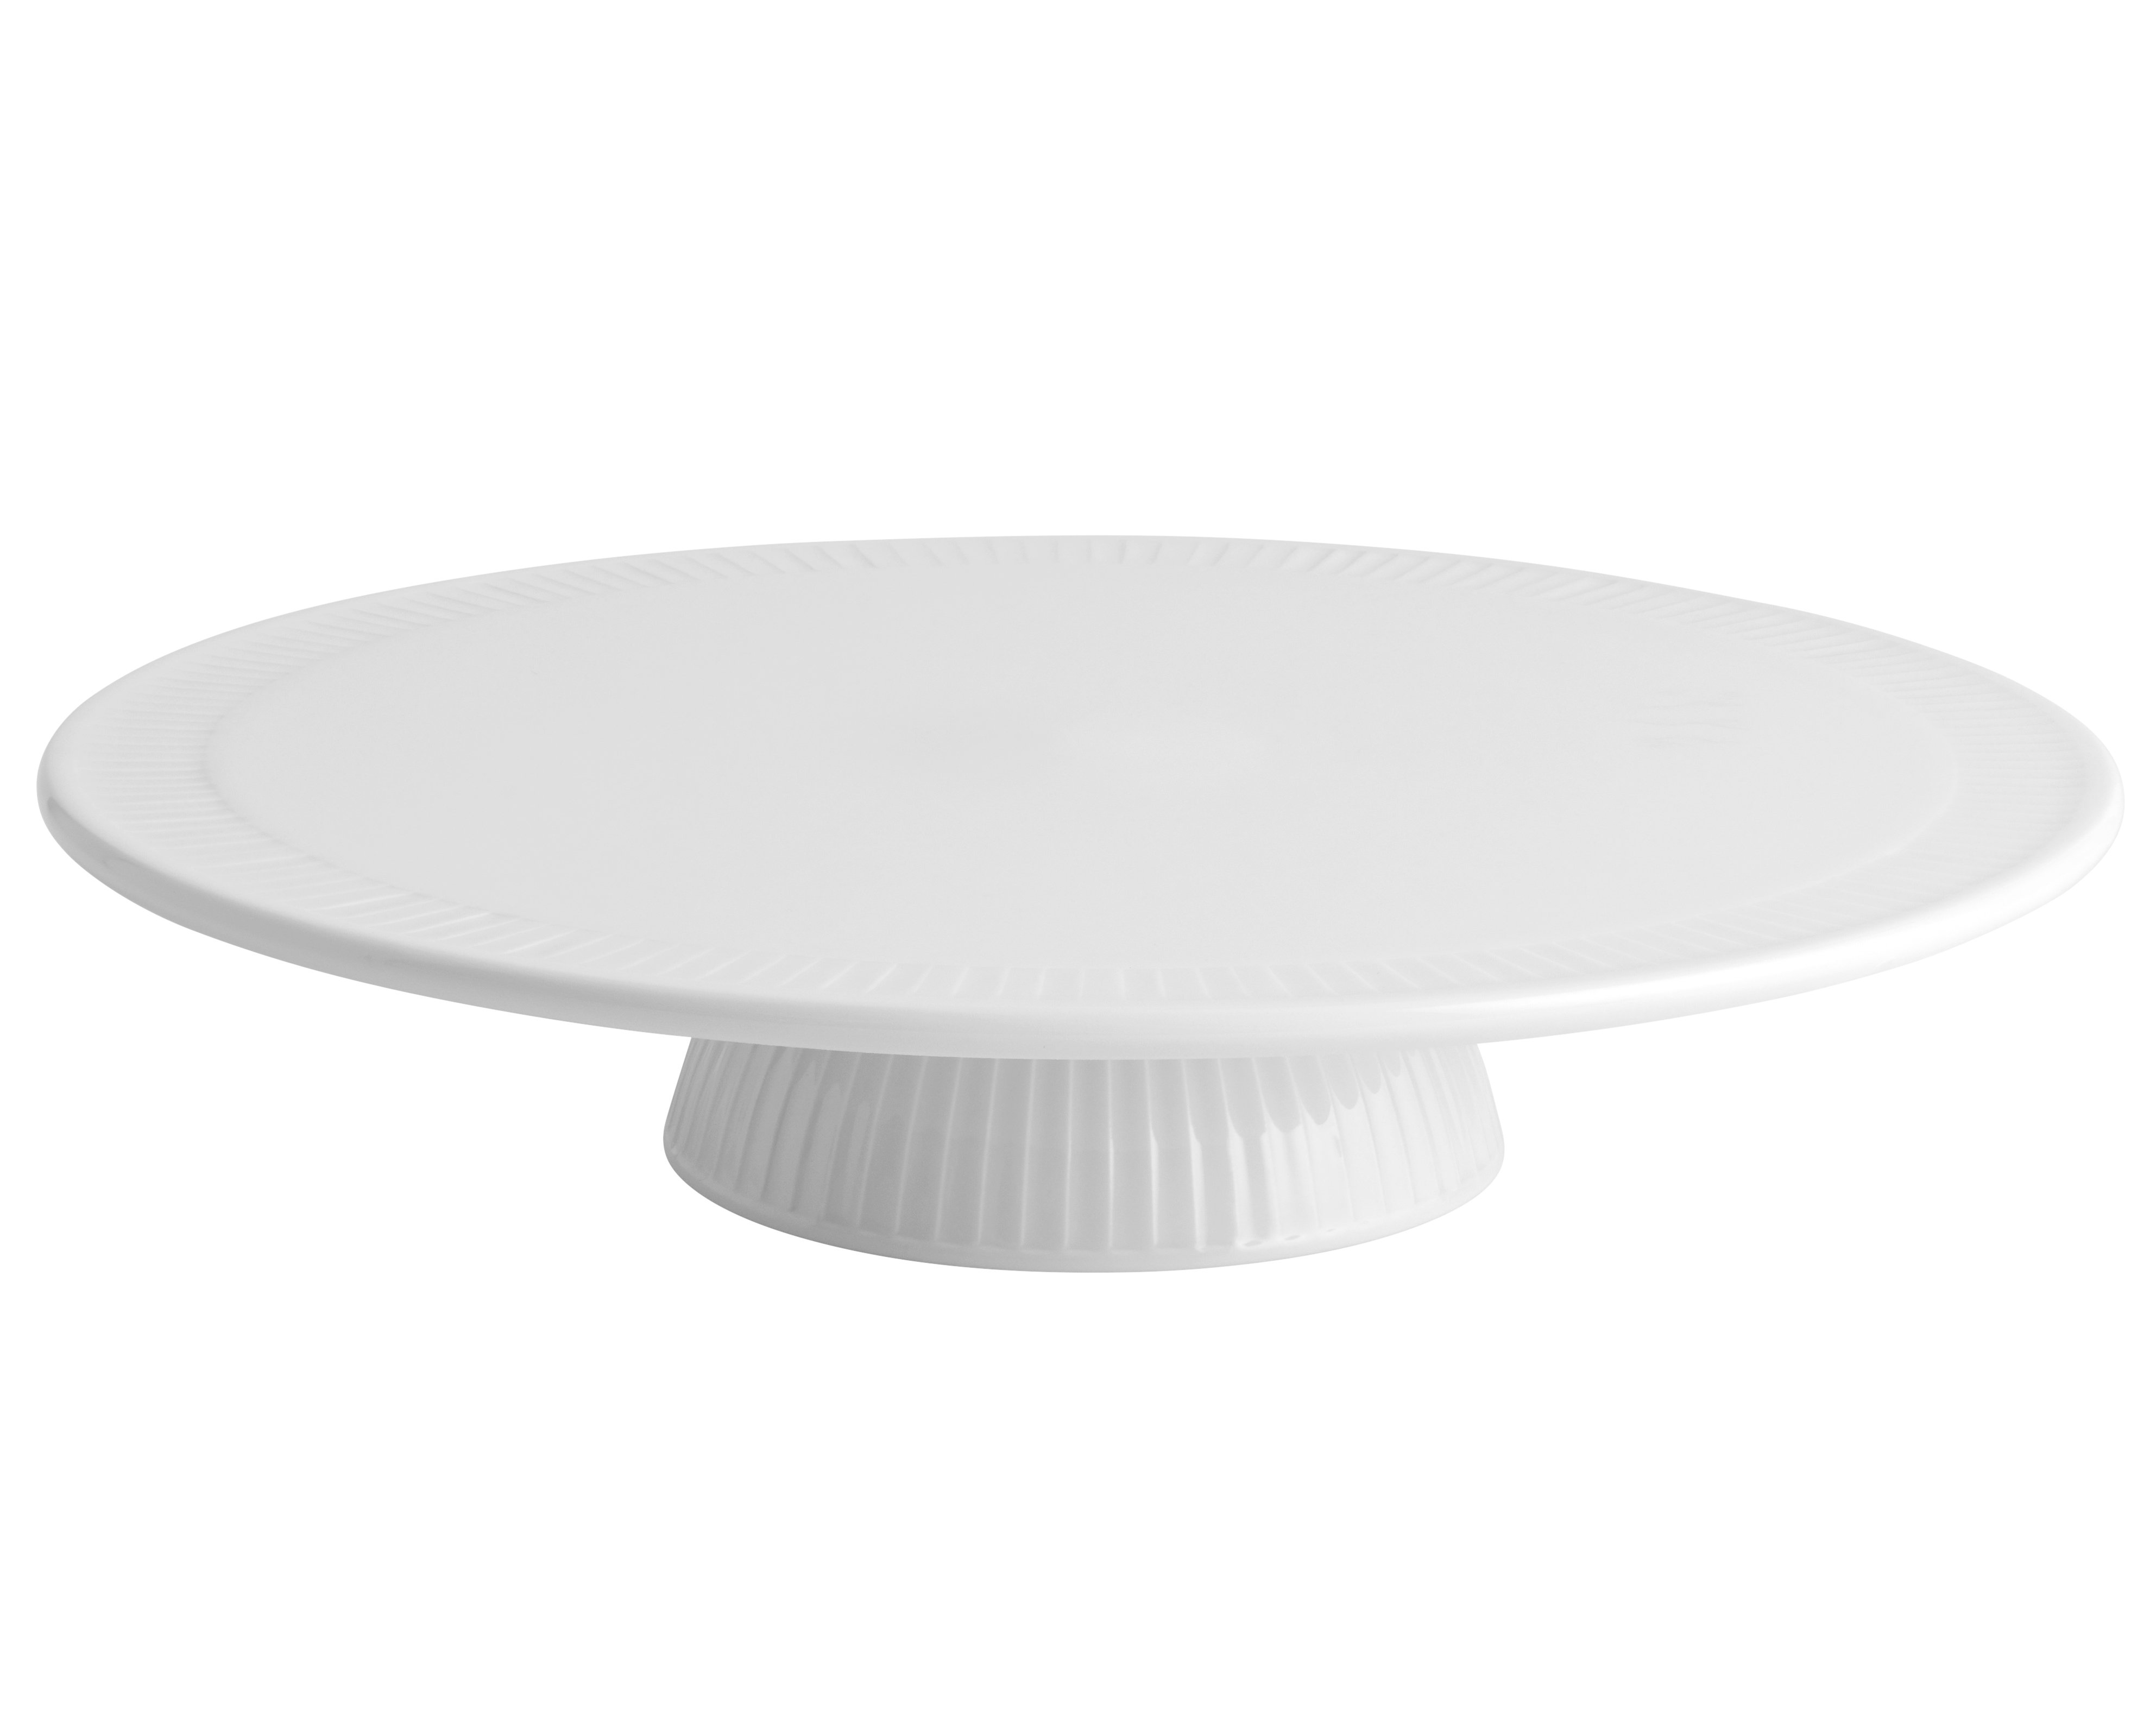 Pillivuyt - Plissé Cake Plate On Foot 30 cm - White (634230)